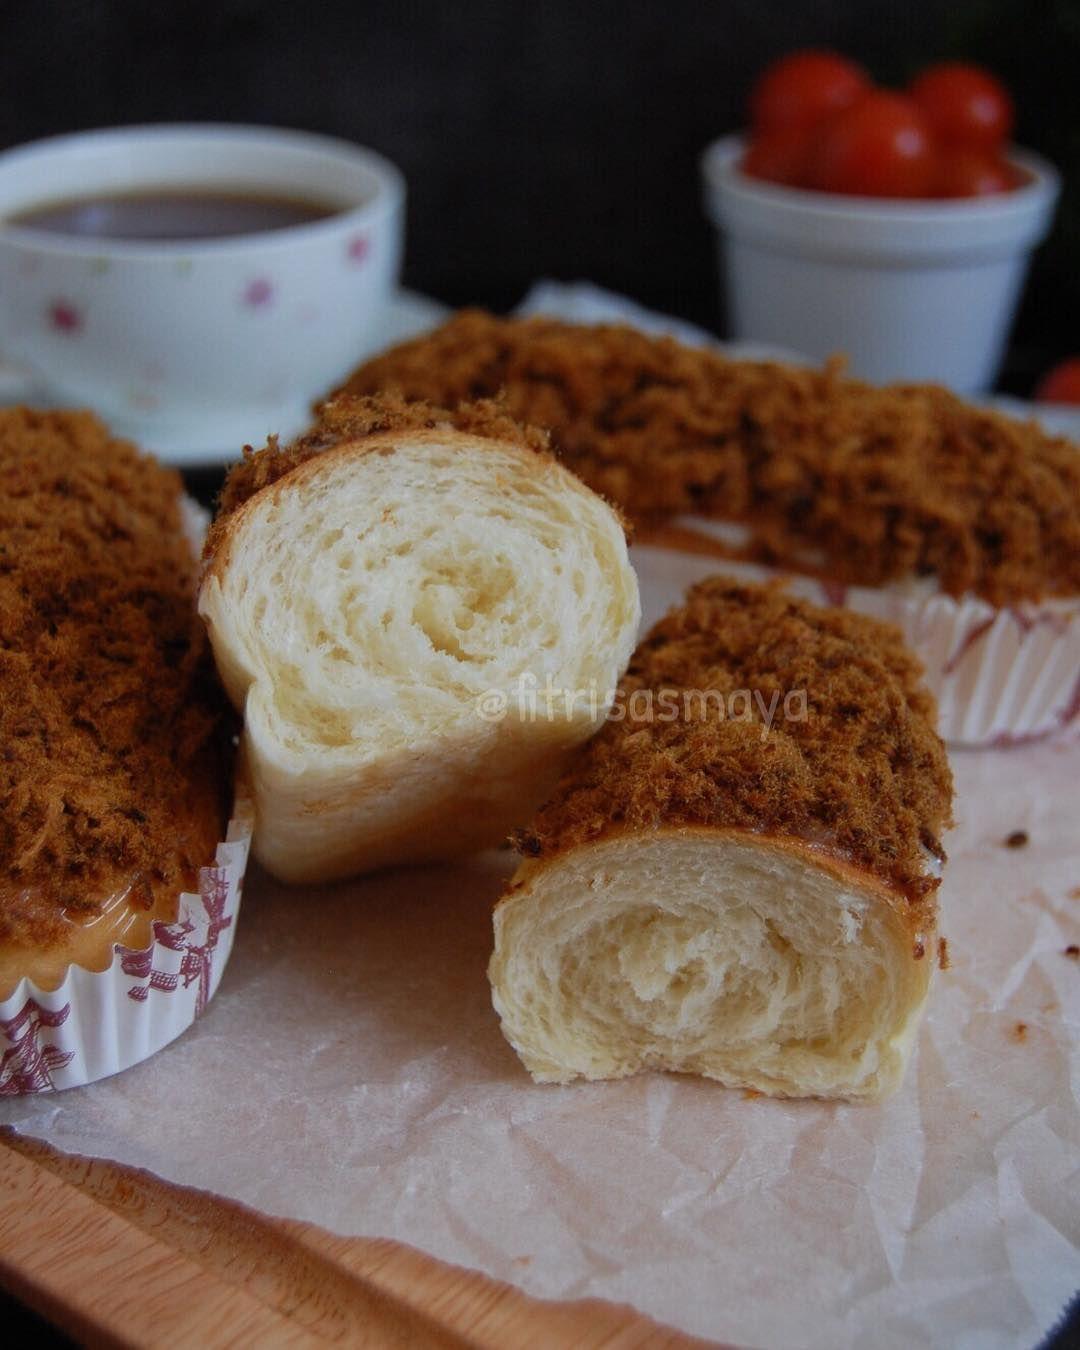 Bismillah Selamat Pagi Teman2 Rabu Itu Roti Sudah Lama Nih G Ikutan Posbadak Bersama Teman2 Emba Kali Ini Saya Buat Roti Abon Food Roti Bread